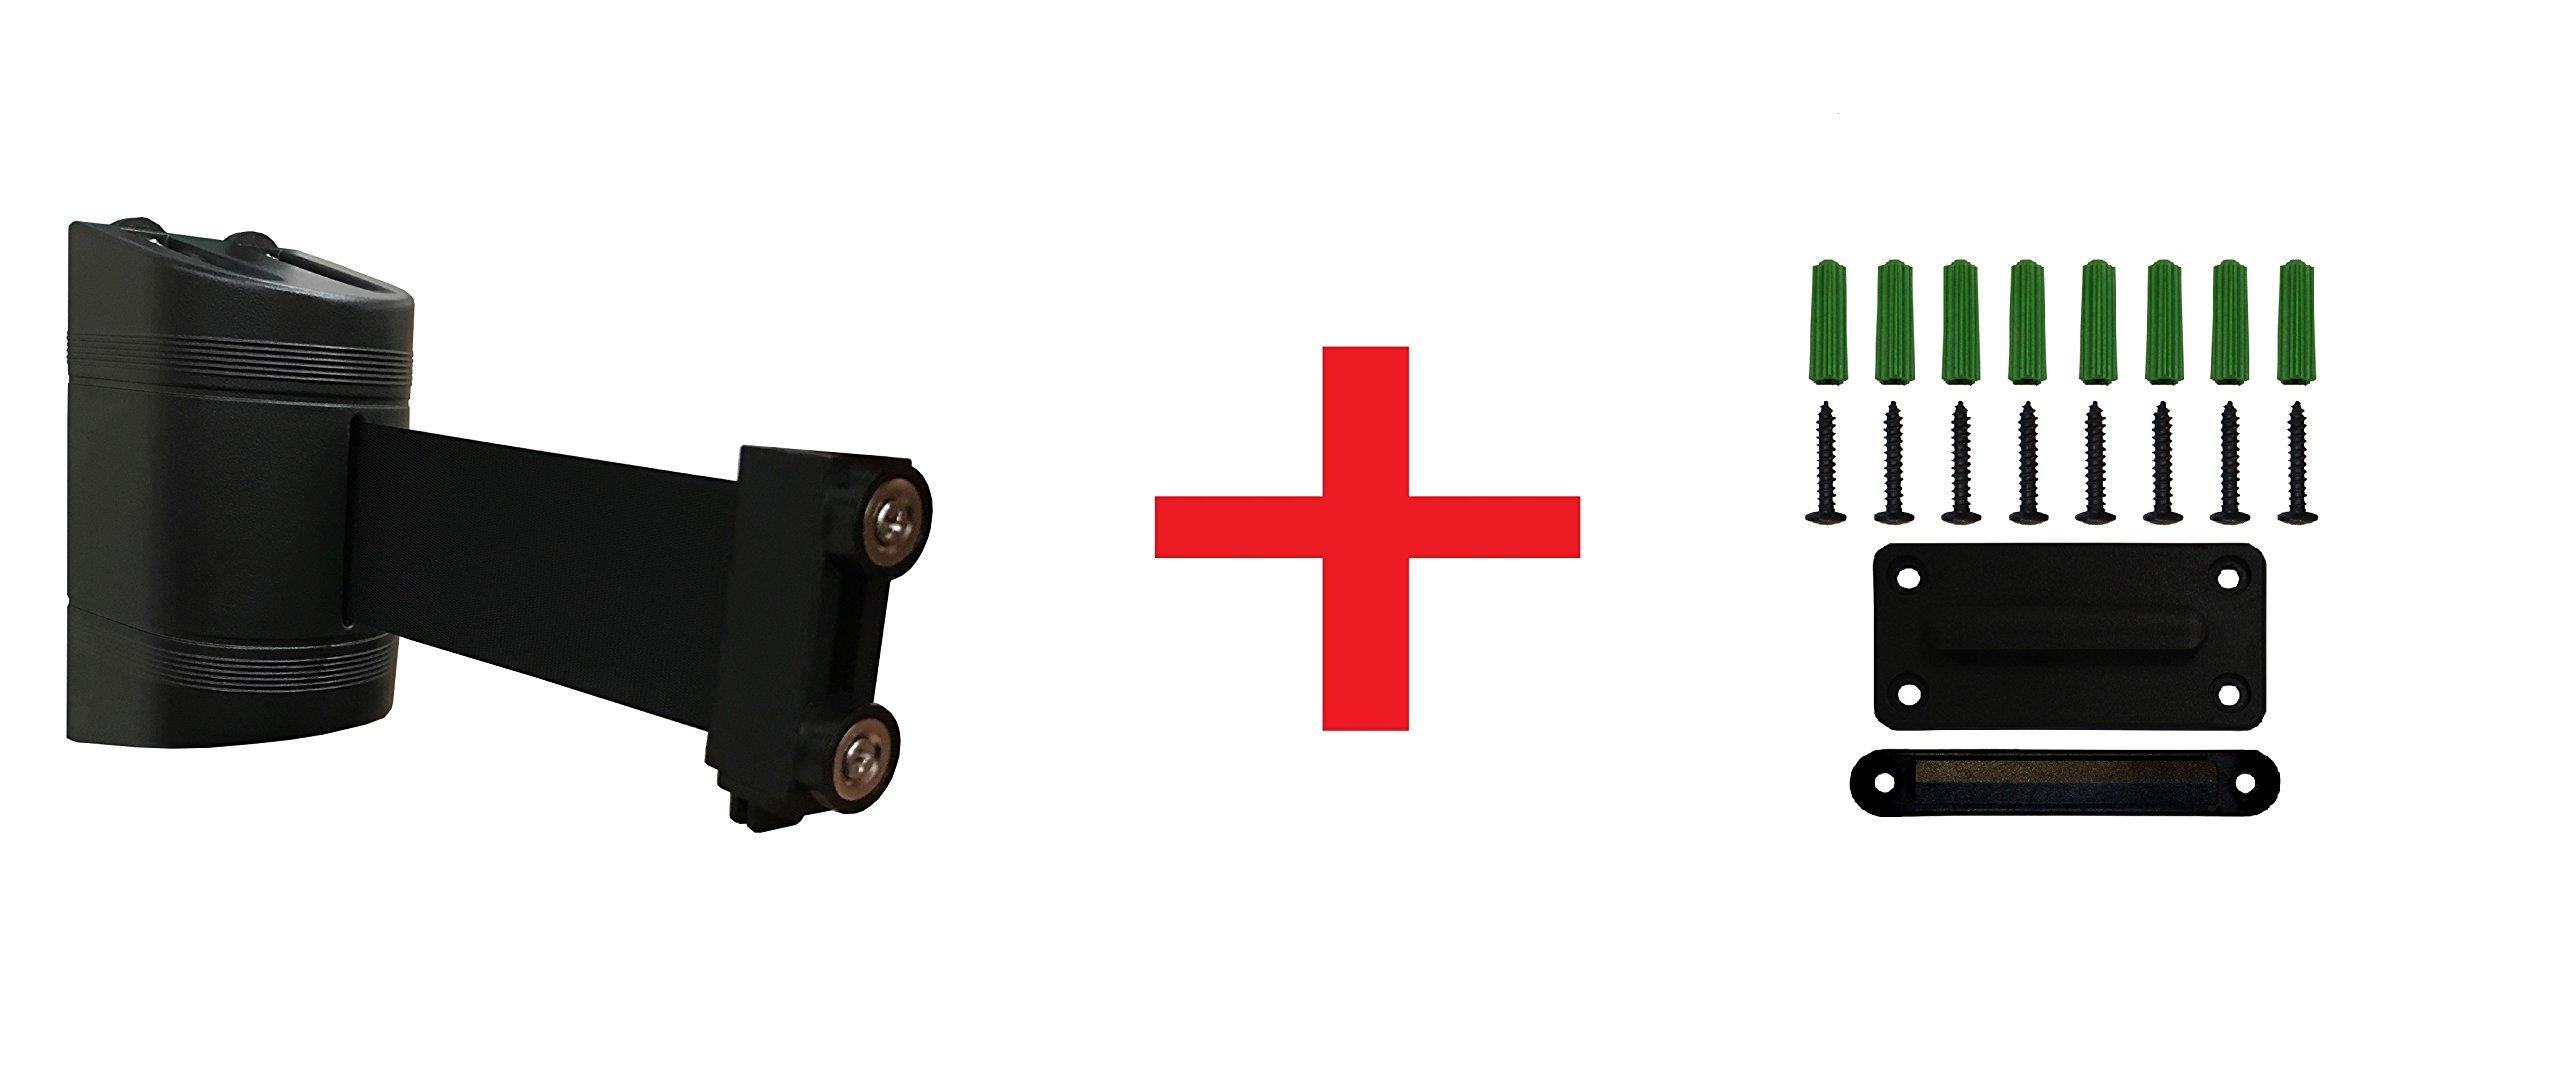 Magnetic Retractable Wall Barrier 120''L, Black Belt